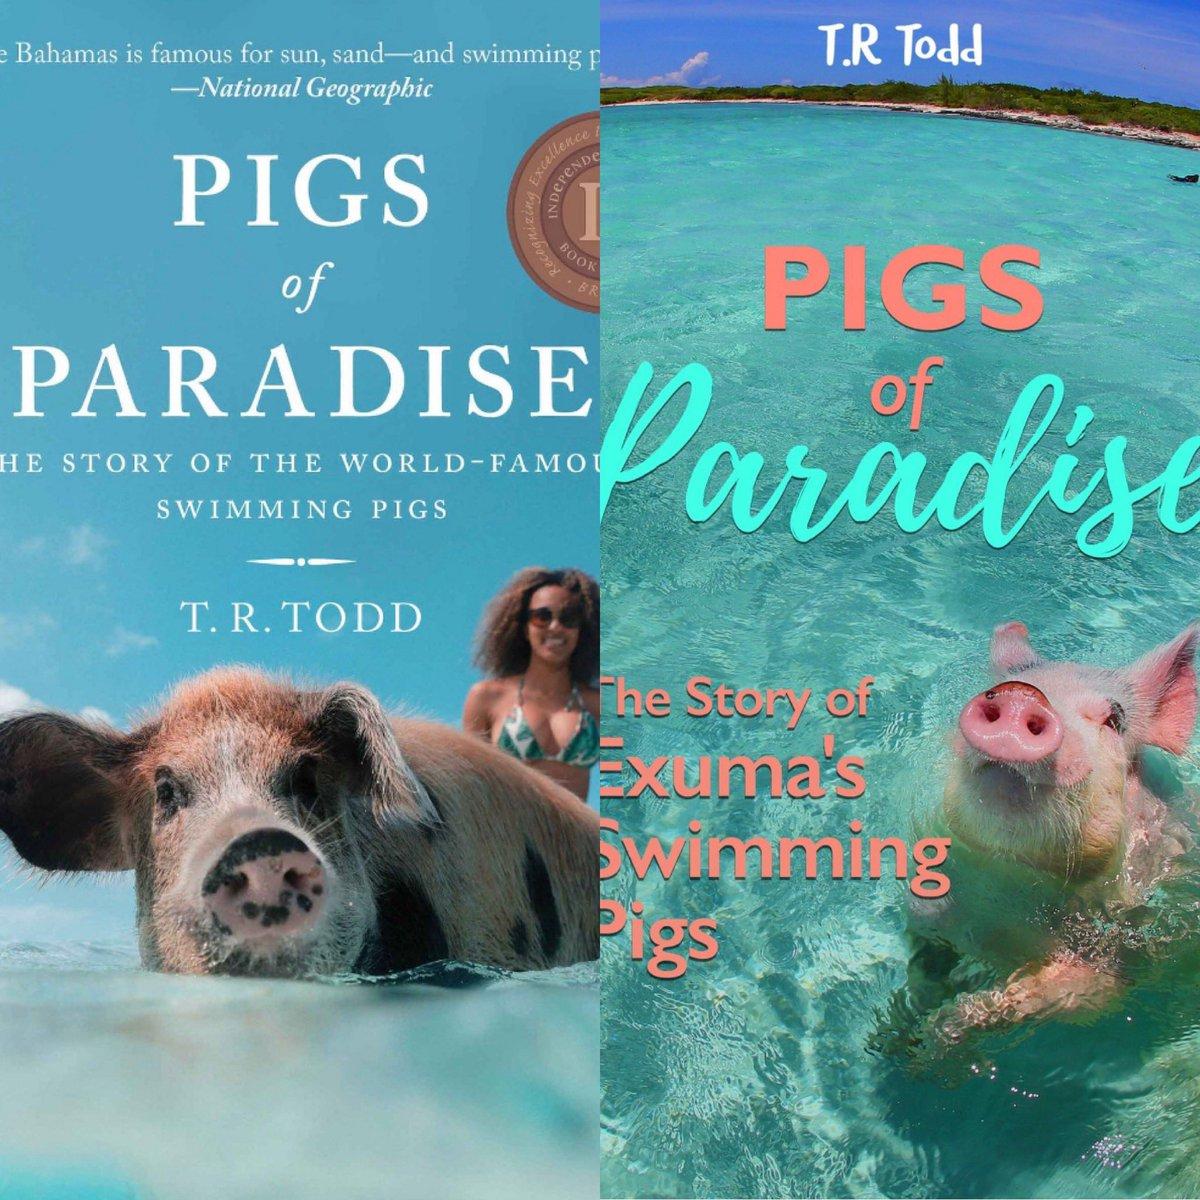 Pigs of Paradise (@PigsofParadise) | Twitter